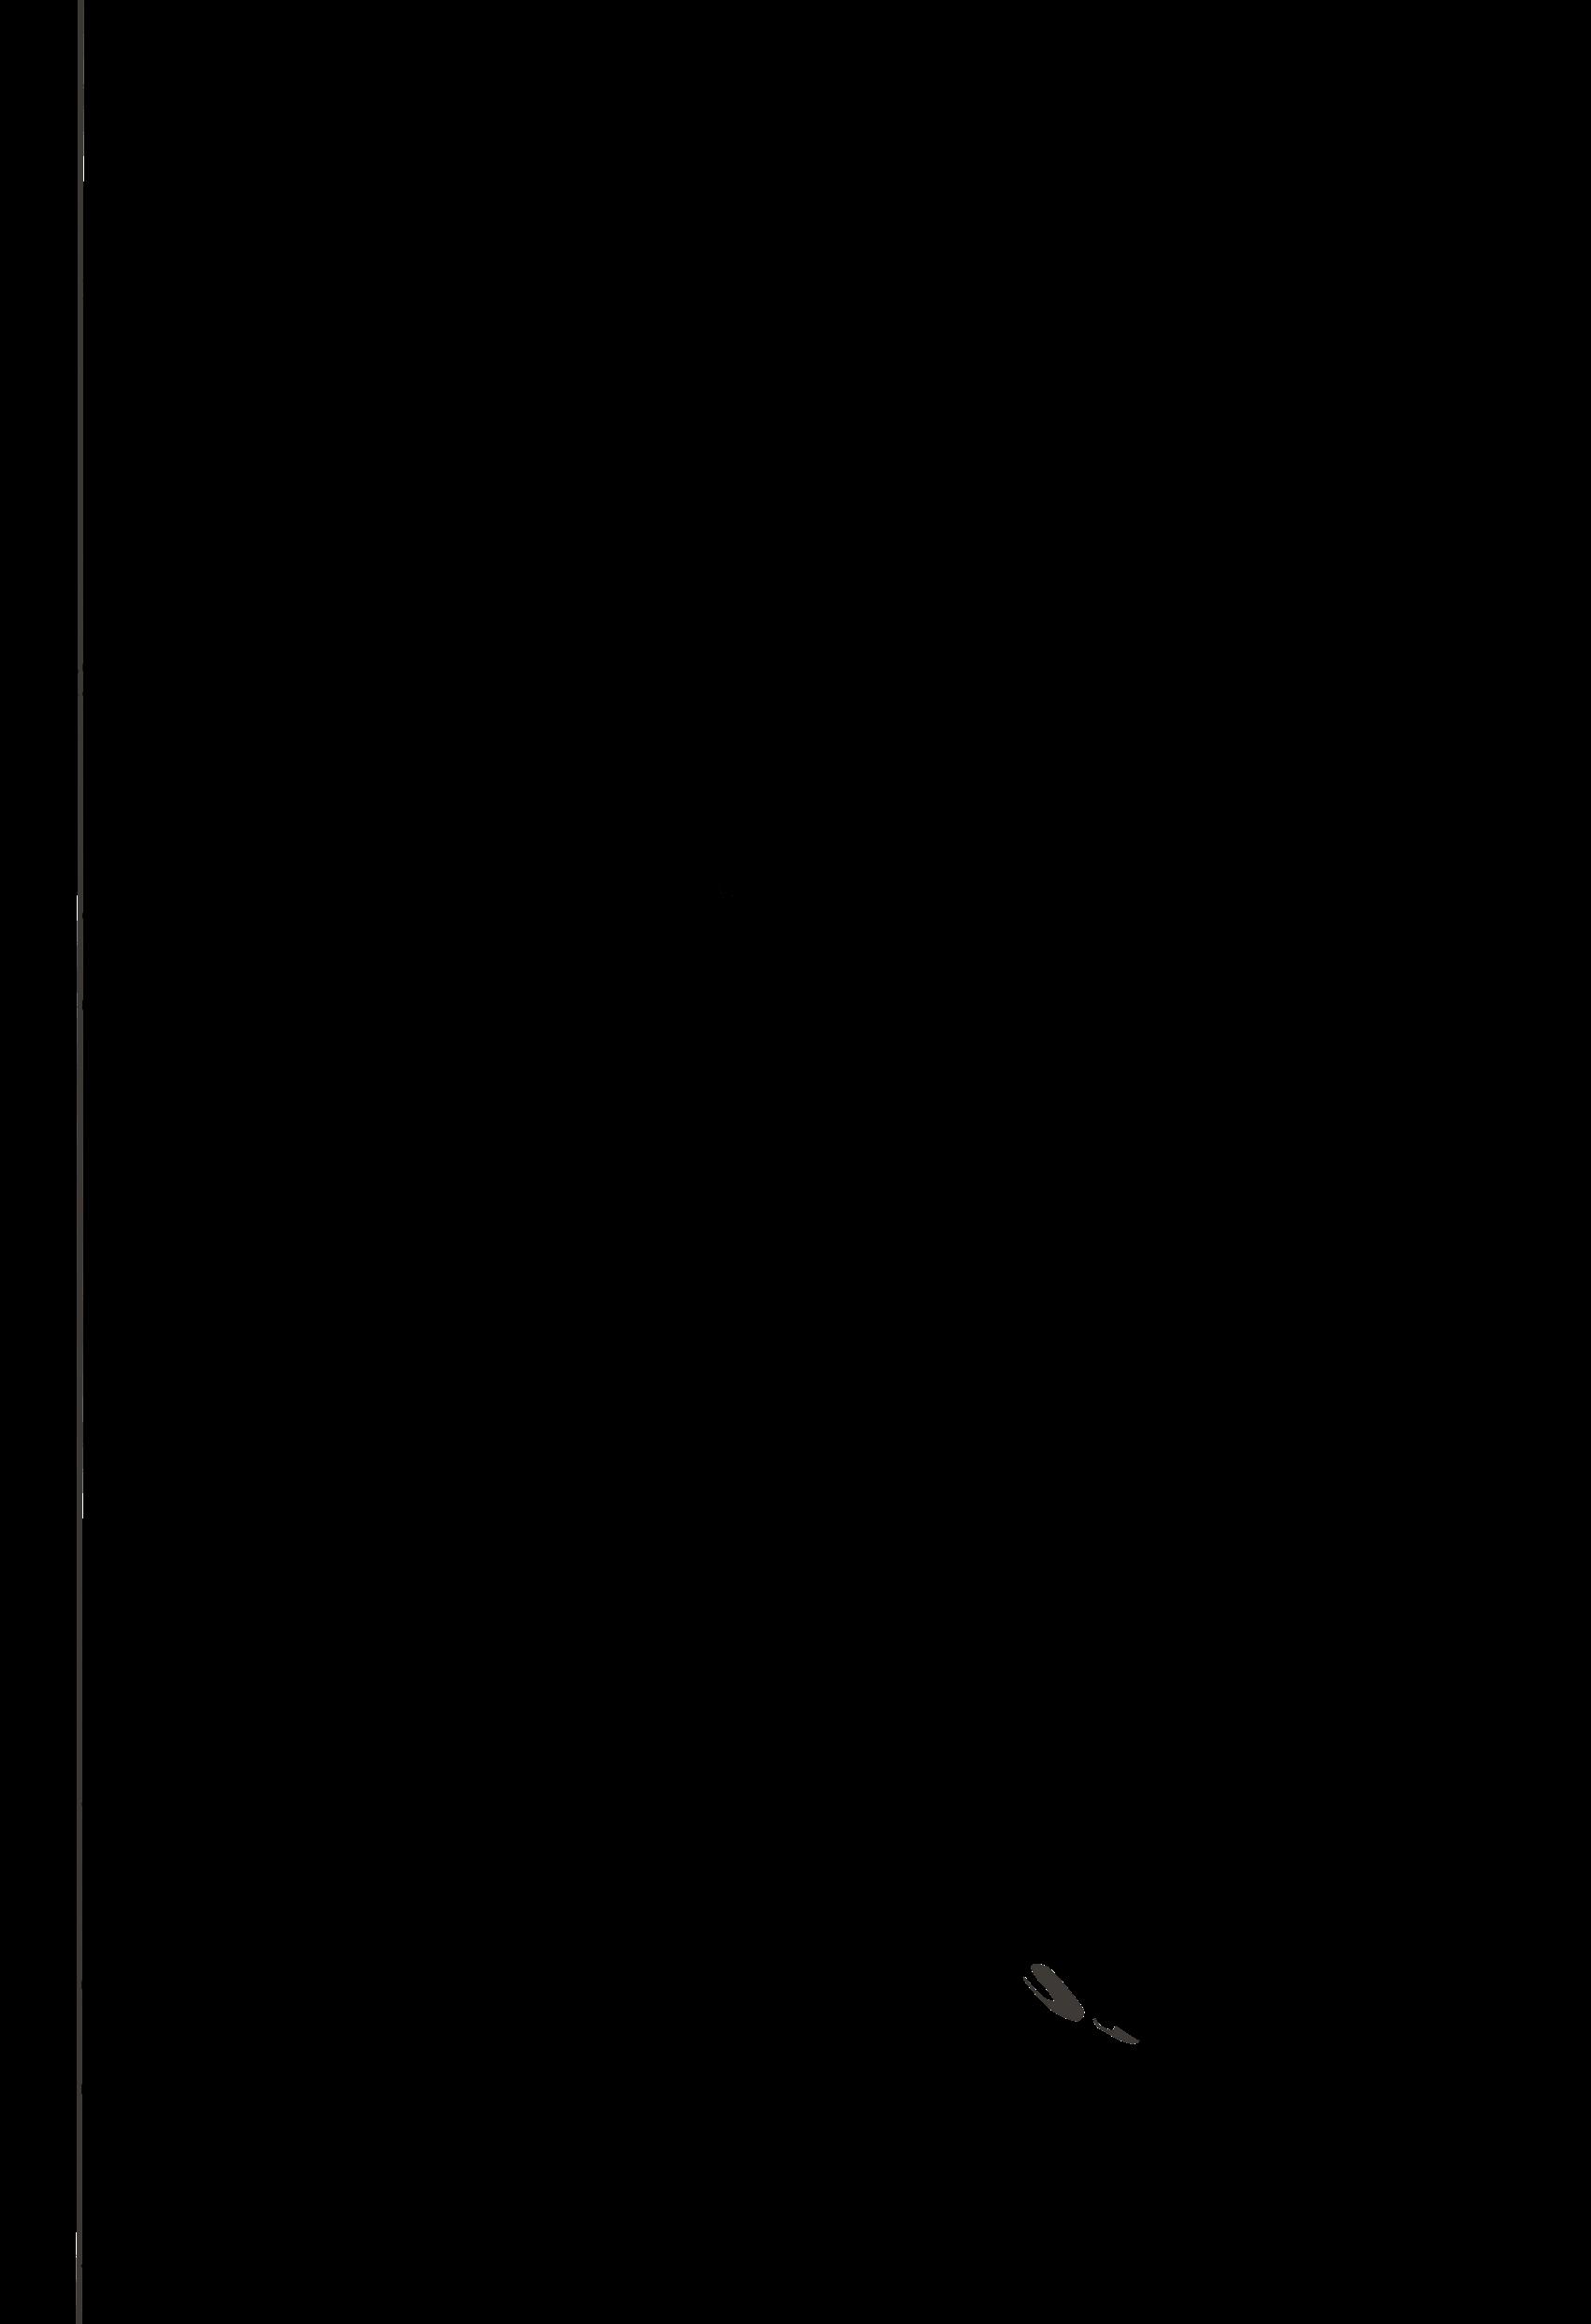 Sasuke Lineart : Sasuke lineart by plaitum on deviantart